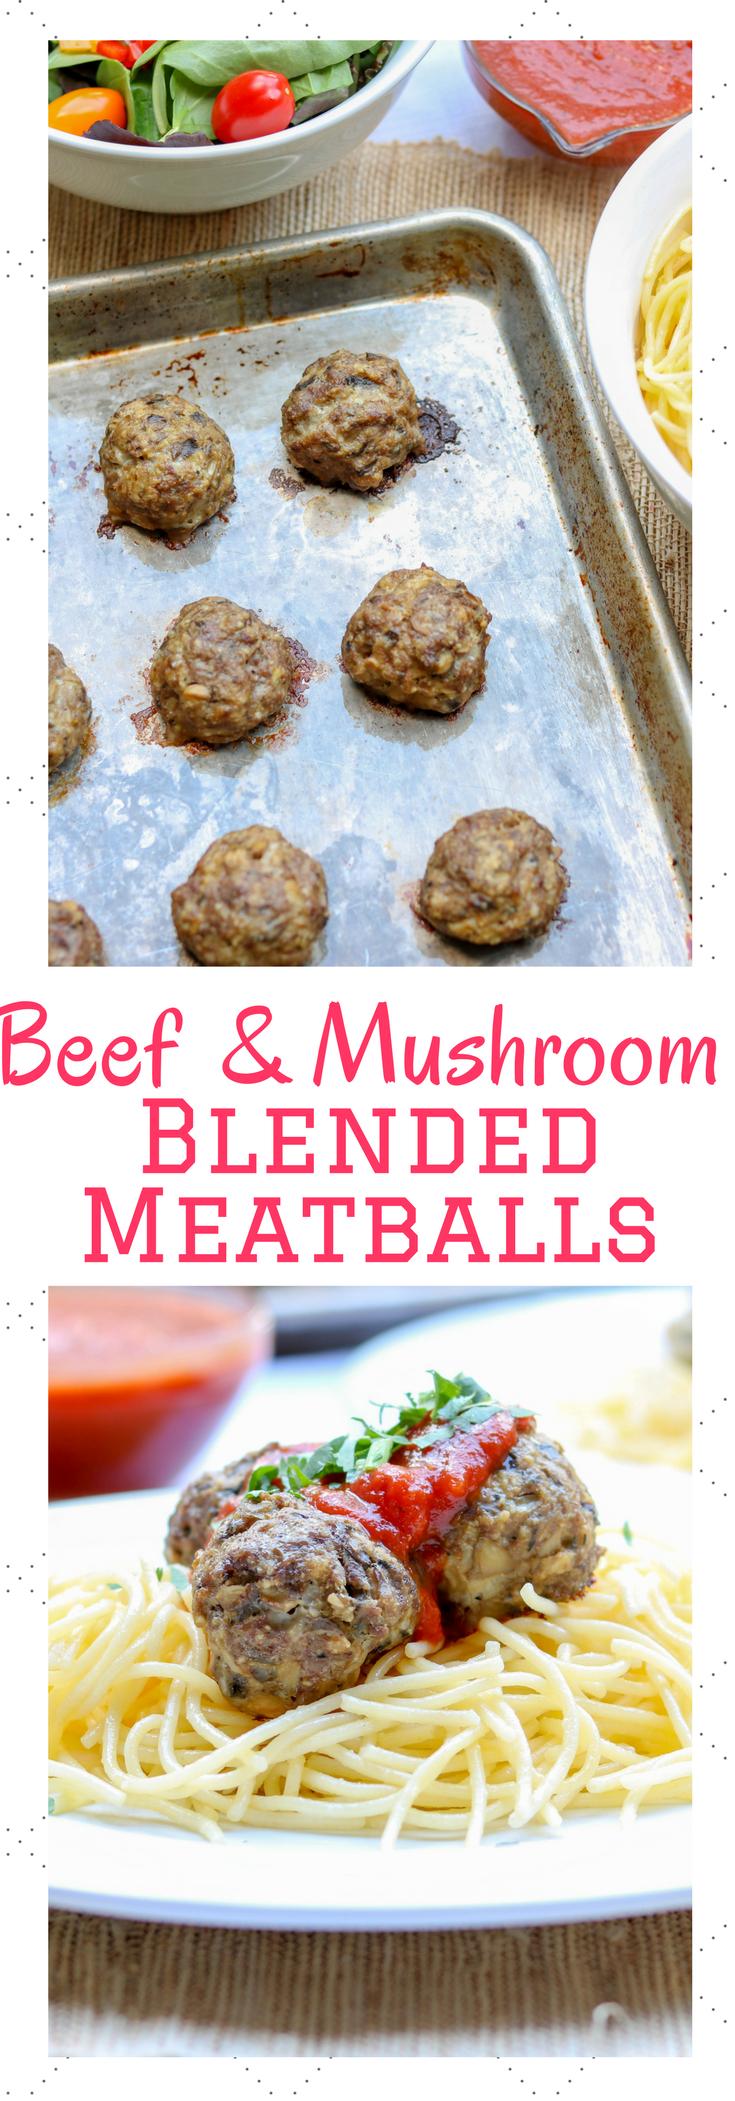 5 Ingredient Beef & Mushroom Blended Meatballs ready in 30 minutes #ad #glutenfree #food #healthyrecipes